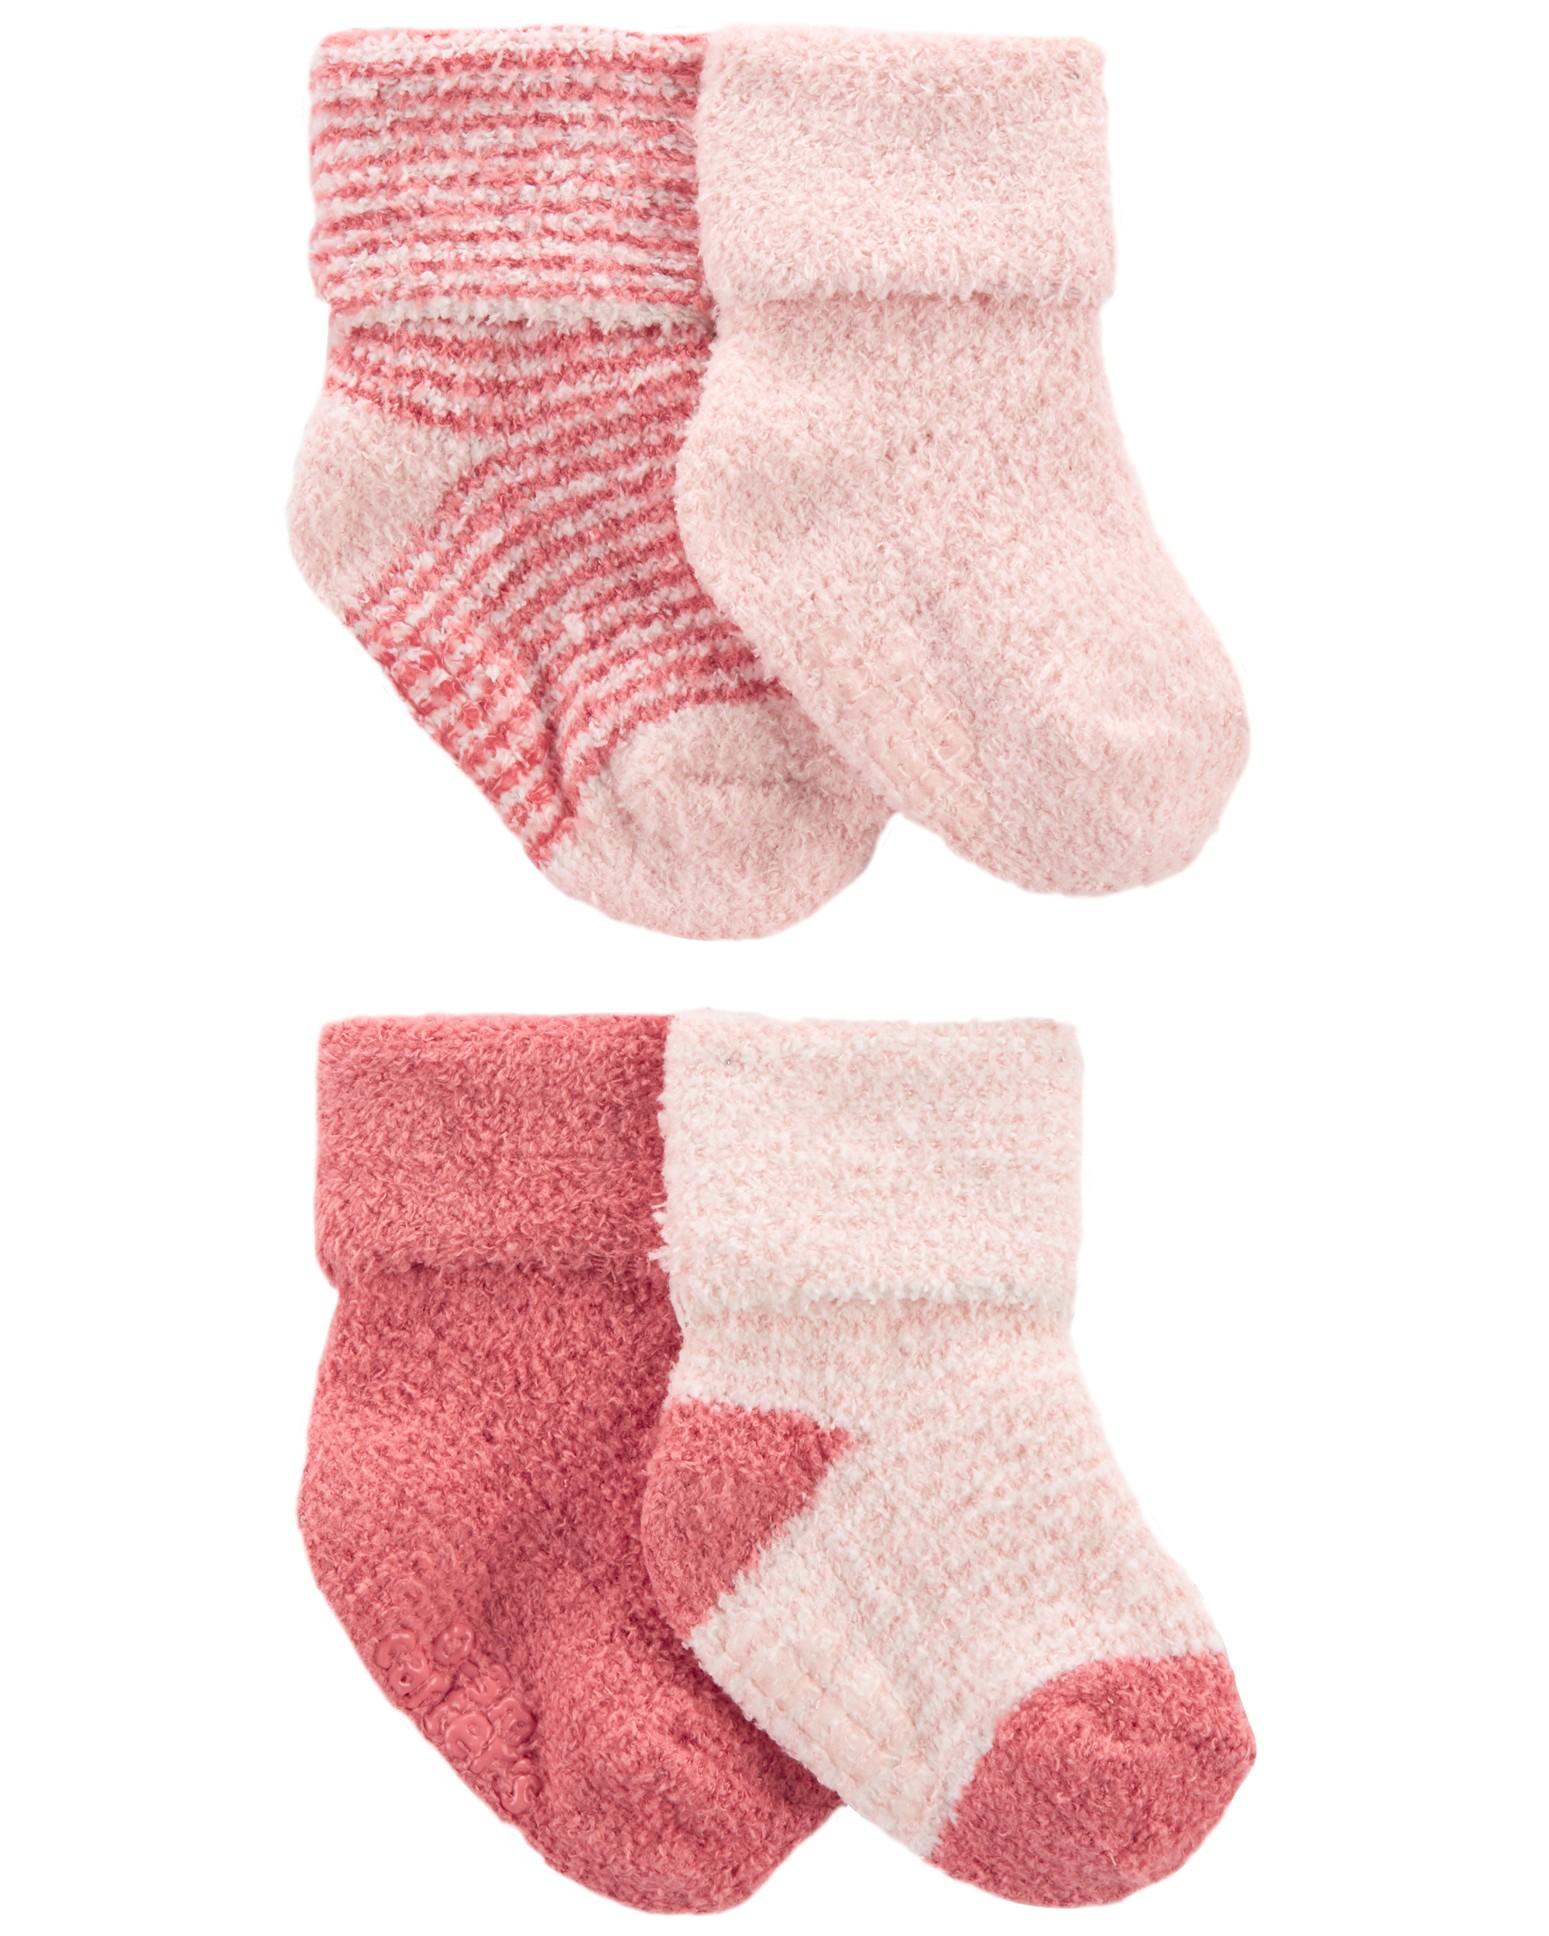 CARTER'S Ponožky Stripes Pink dievča LBB 4ks 3-12m